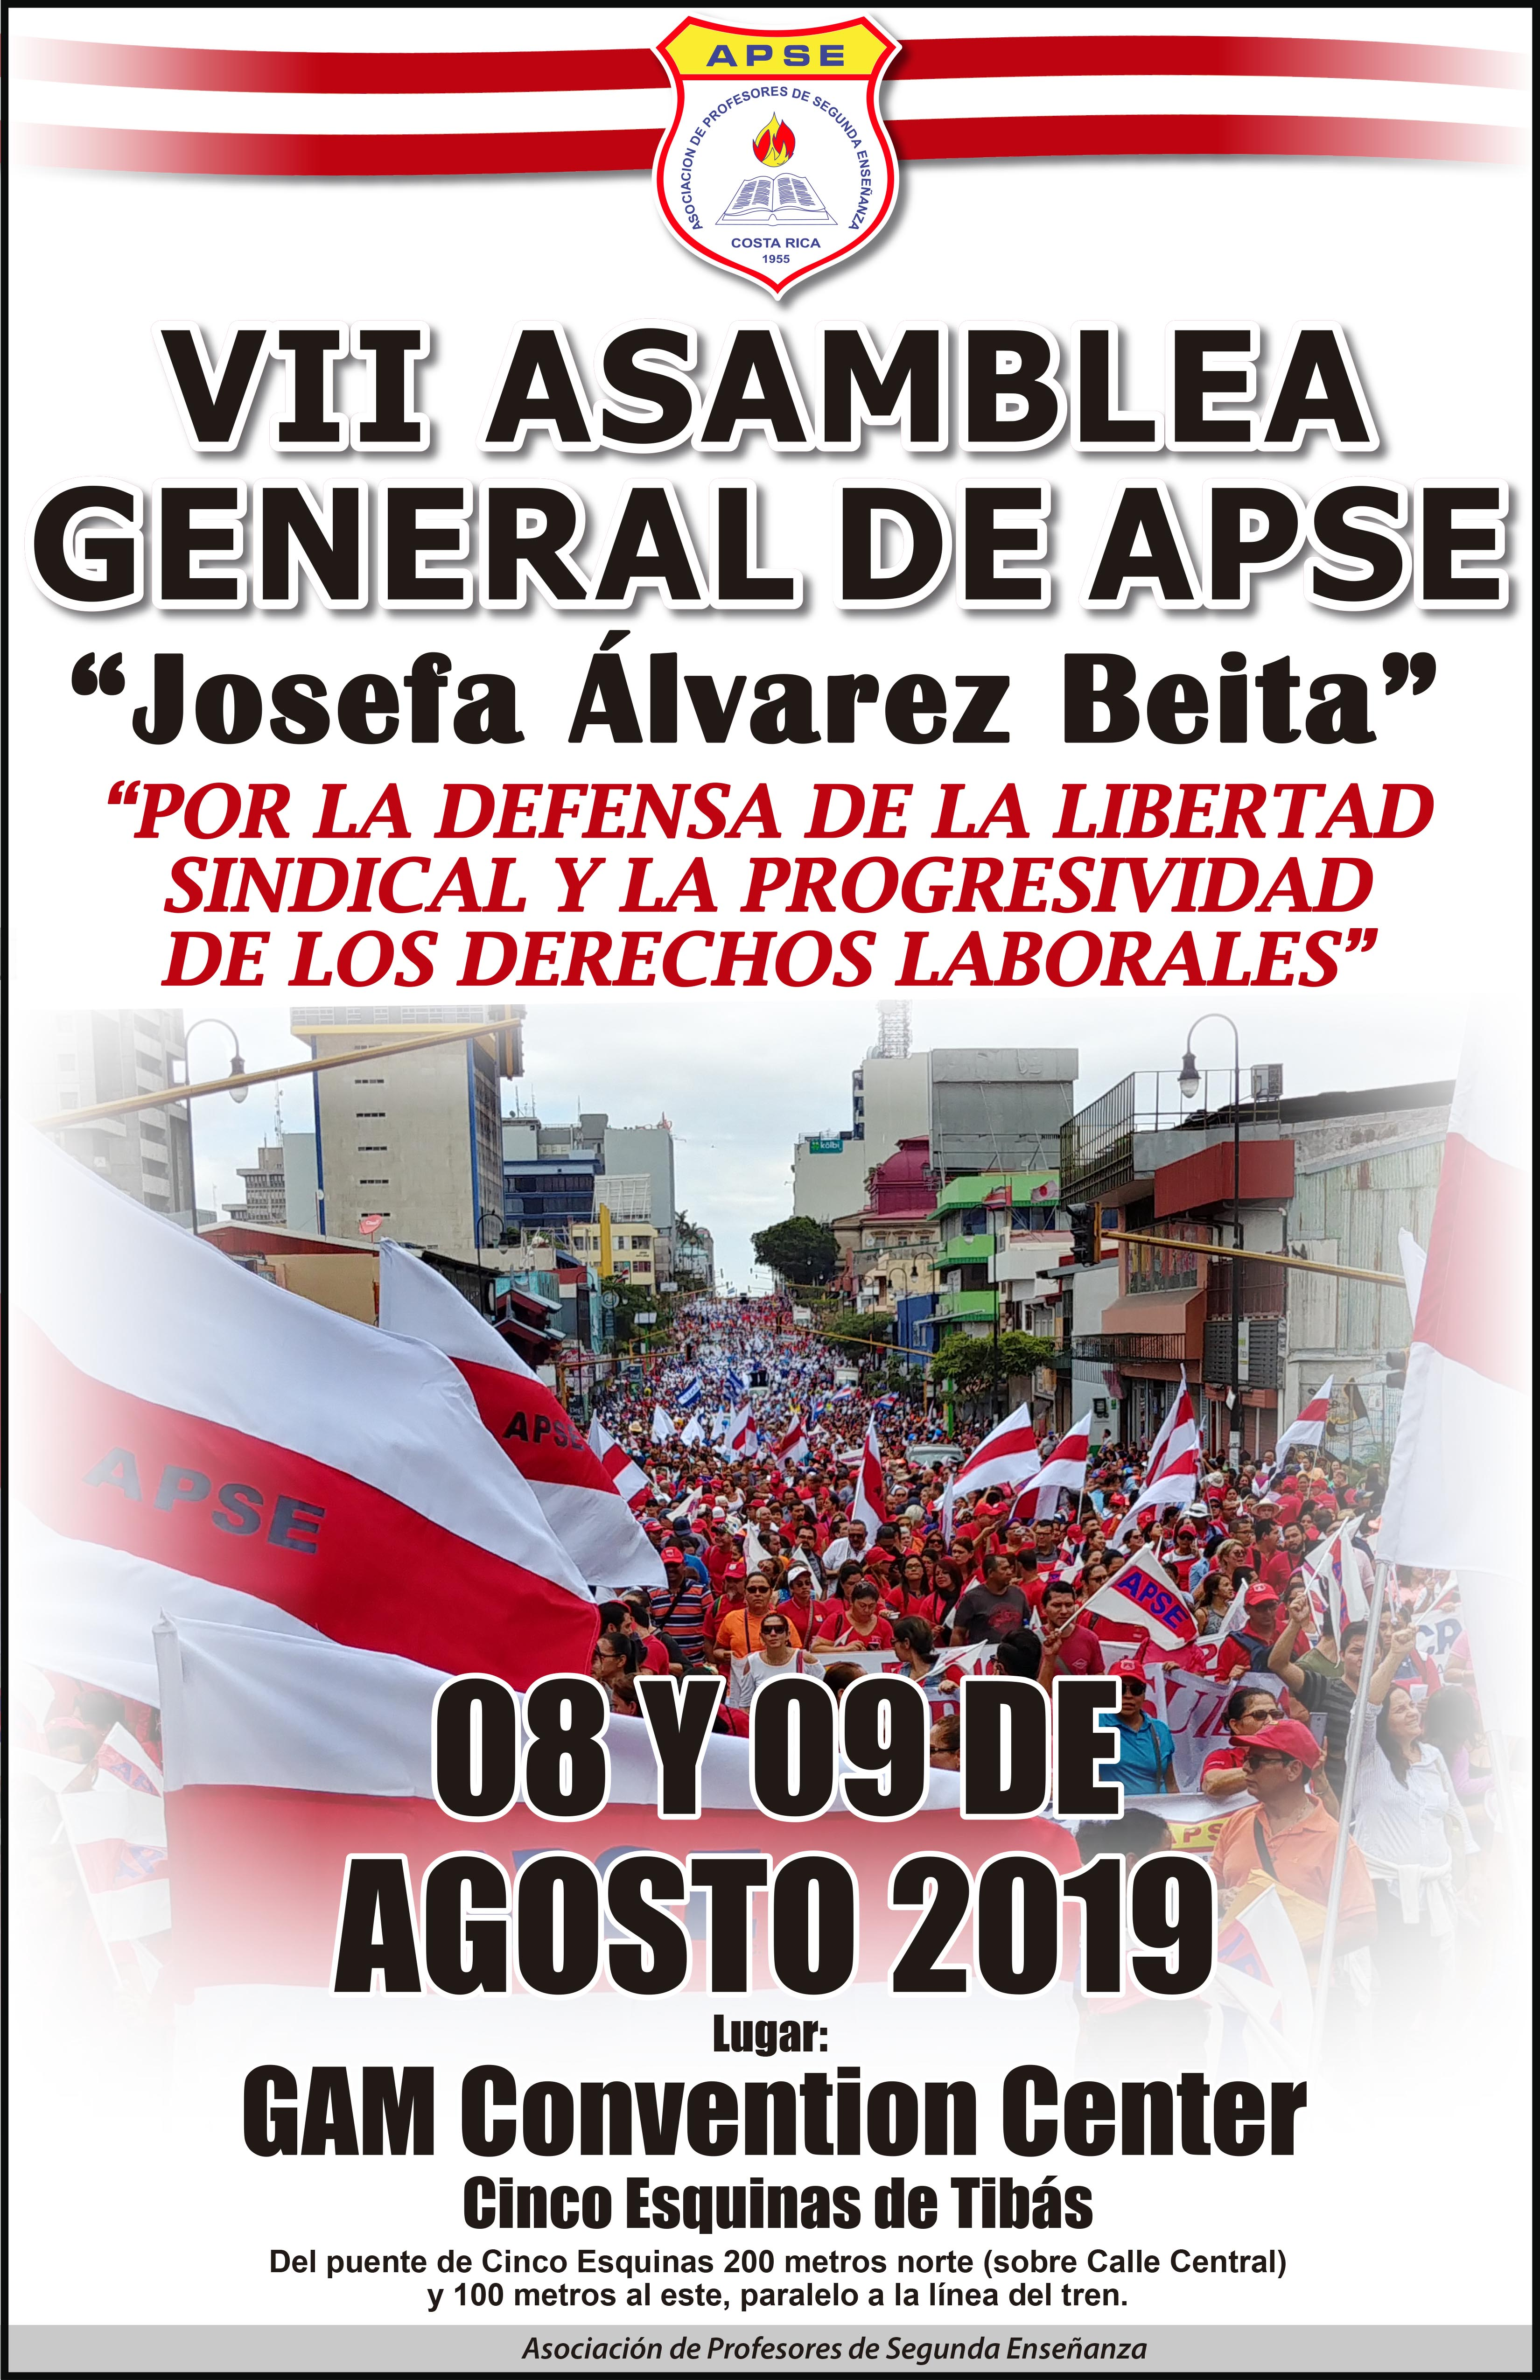 VII ASAMBLEA GENERAL DE APSE